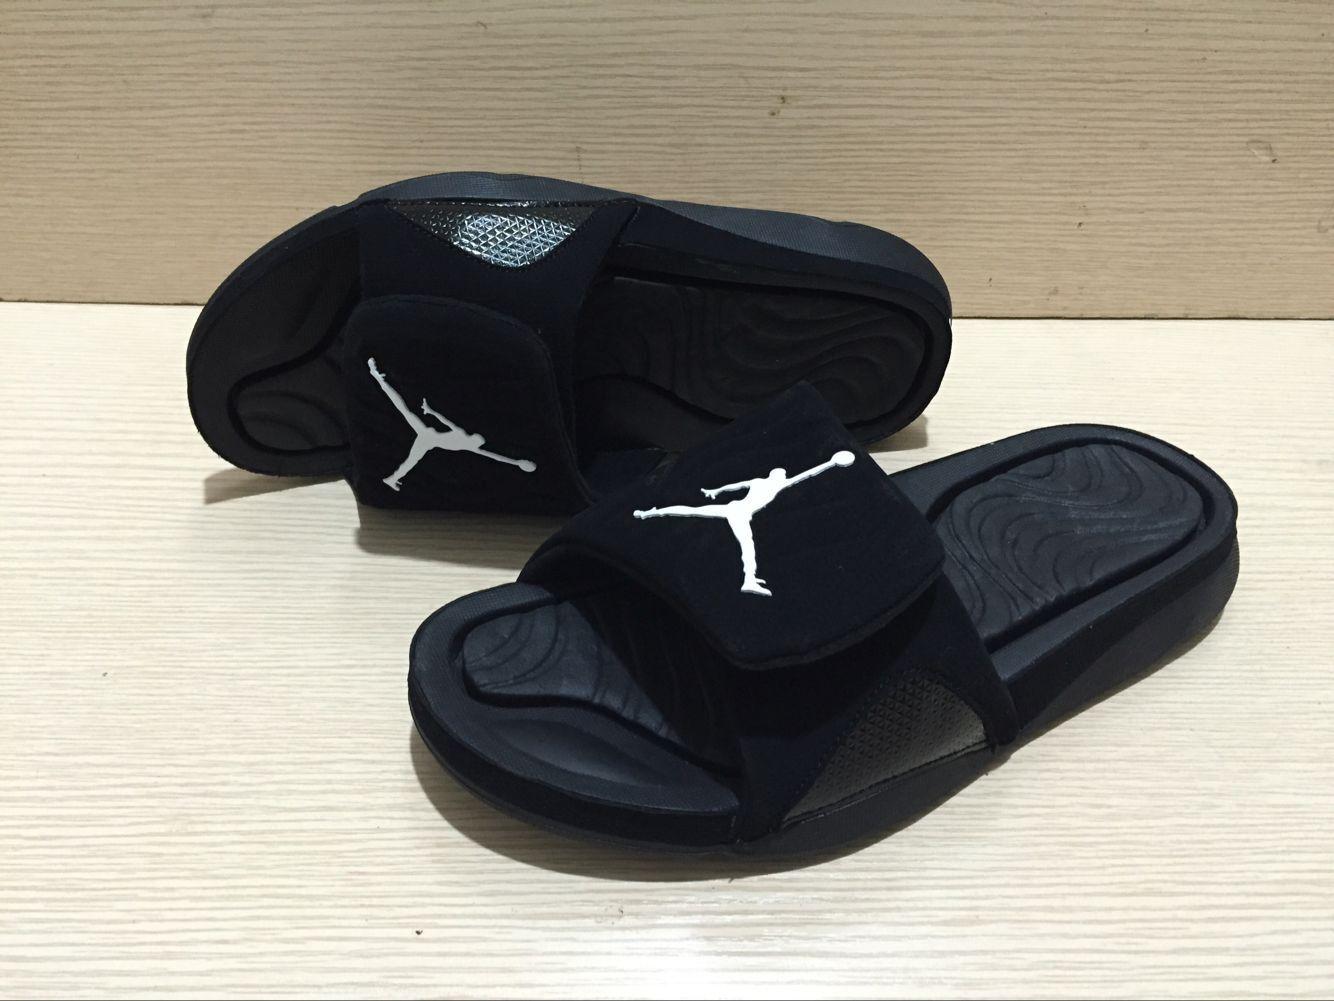 Mädchen Sport Star Printing Hydro 4 Slipper Qualitäts BrandSlippers Frauen-Sommer-Gummi-Sandalen Strand Slide Mode Scuffs YYC 20022708T